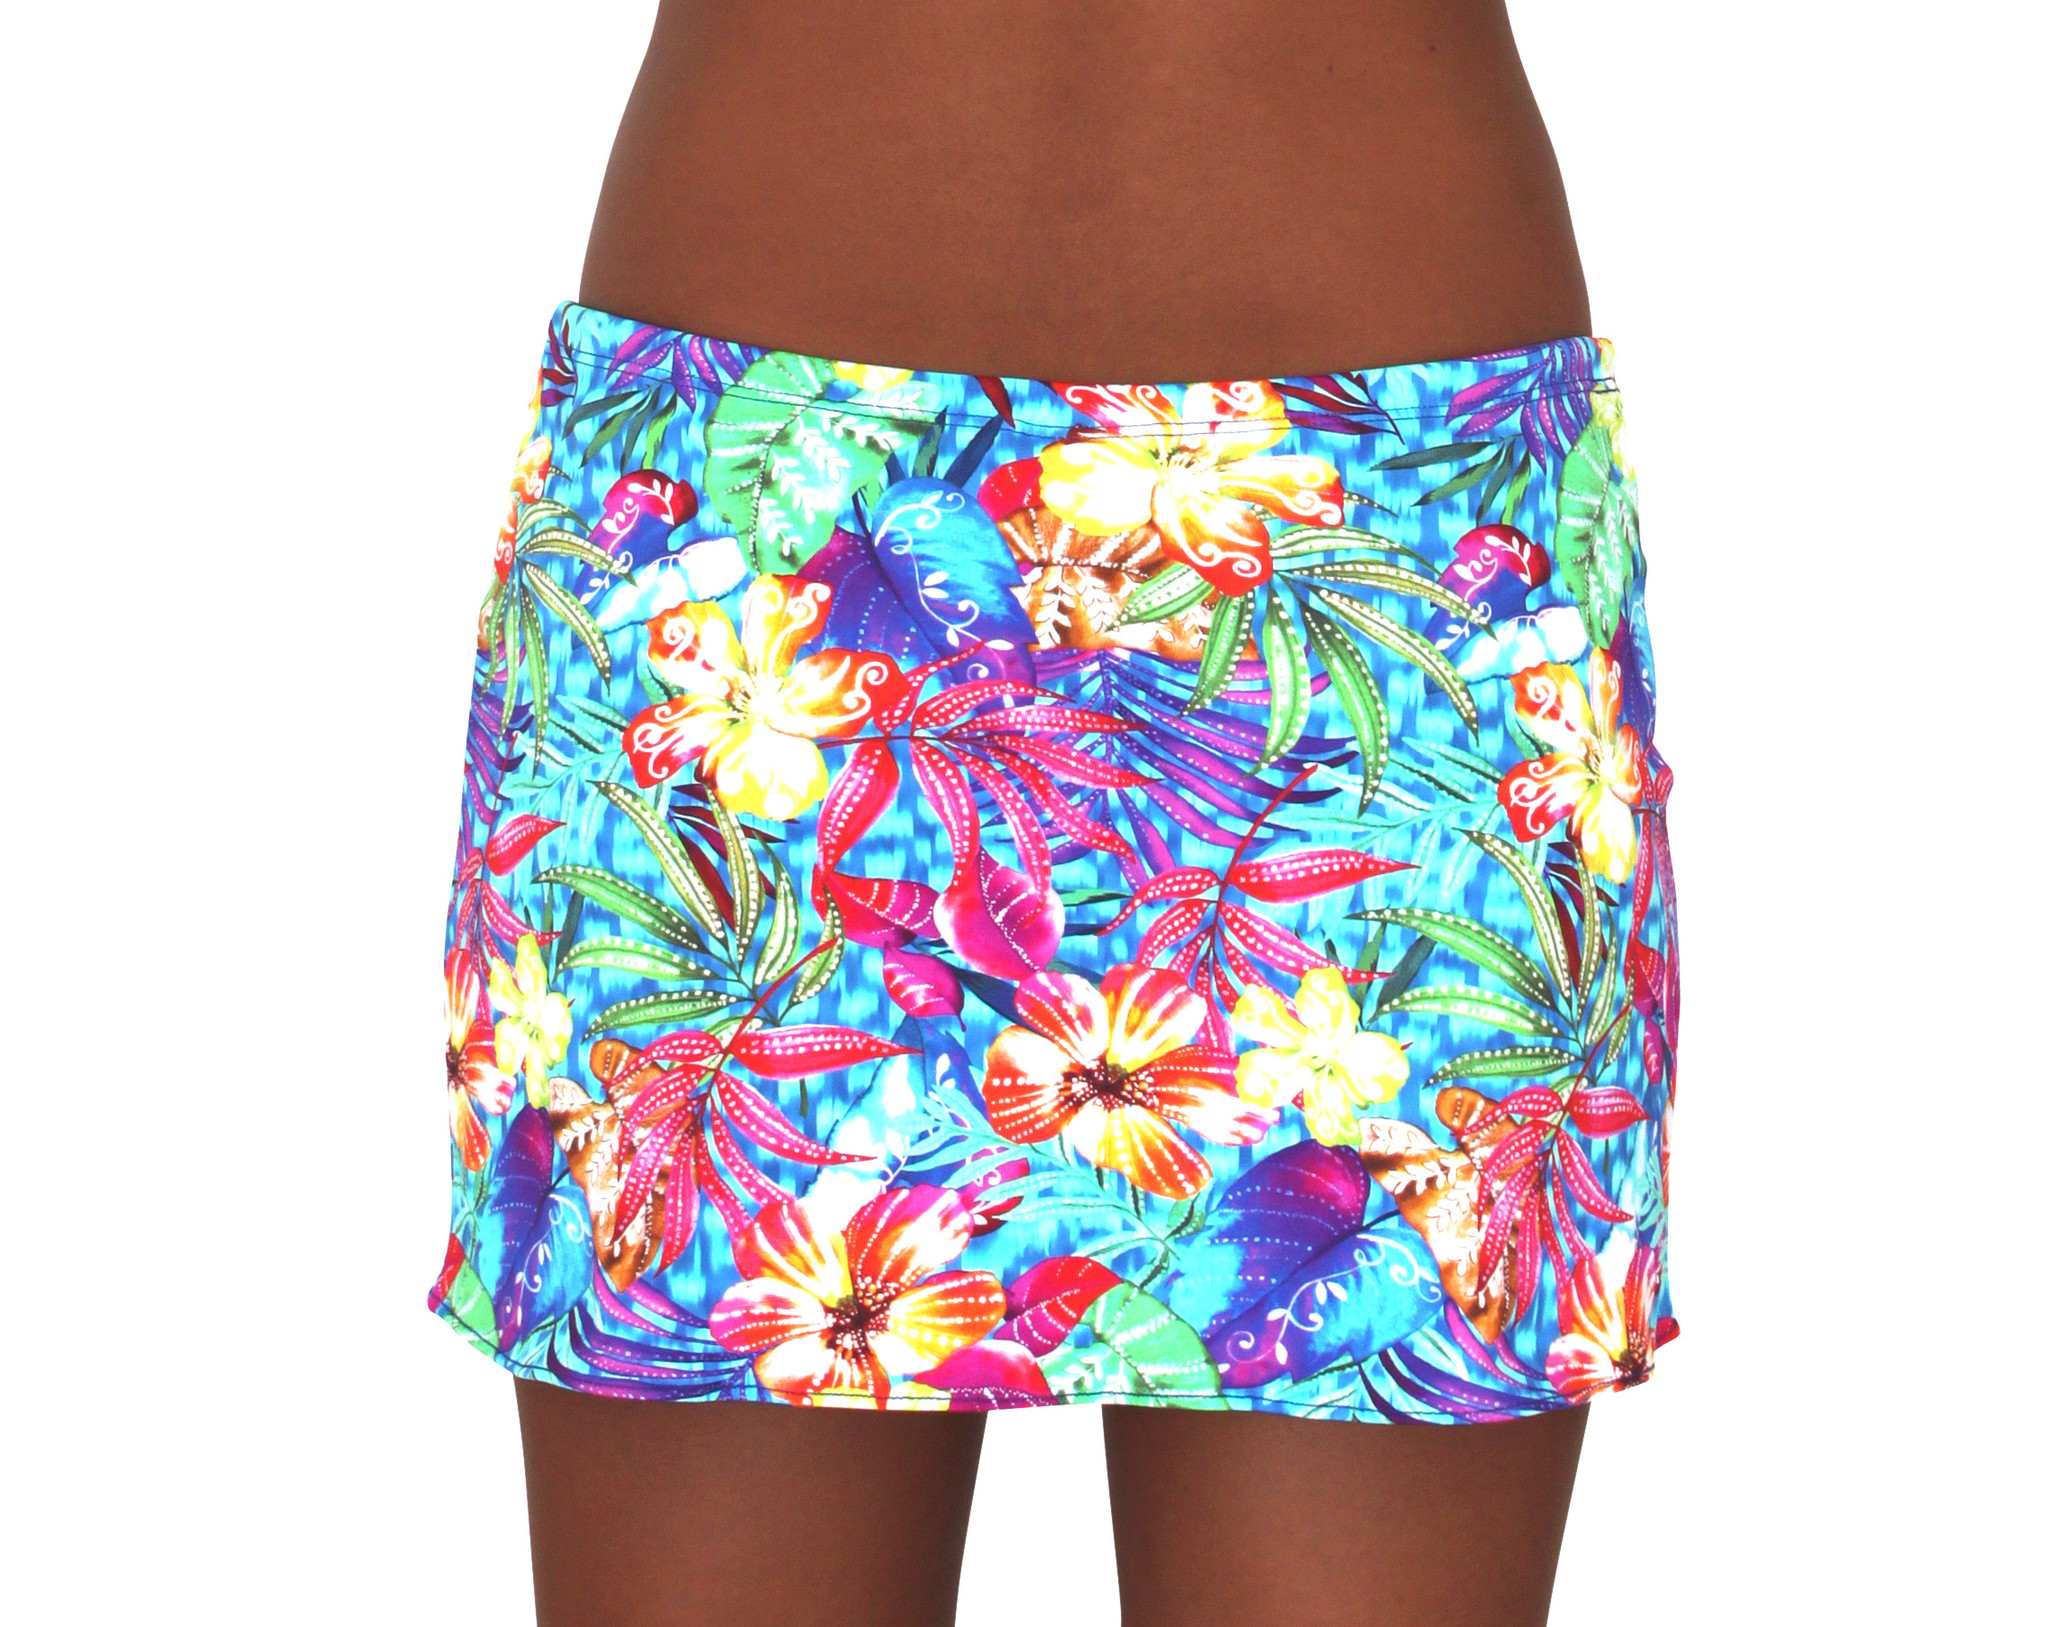 Pualani Short Drawstring Skirt Paradise